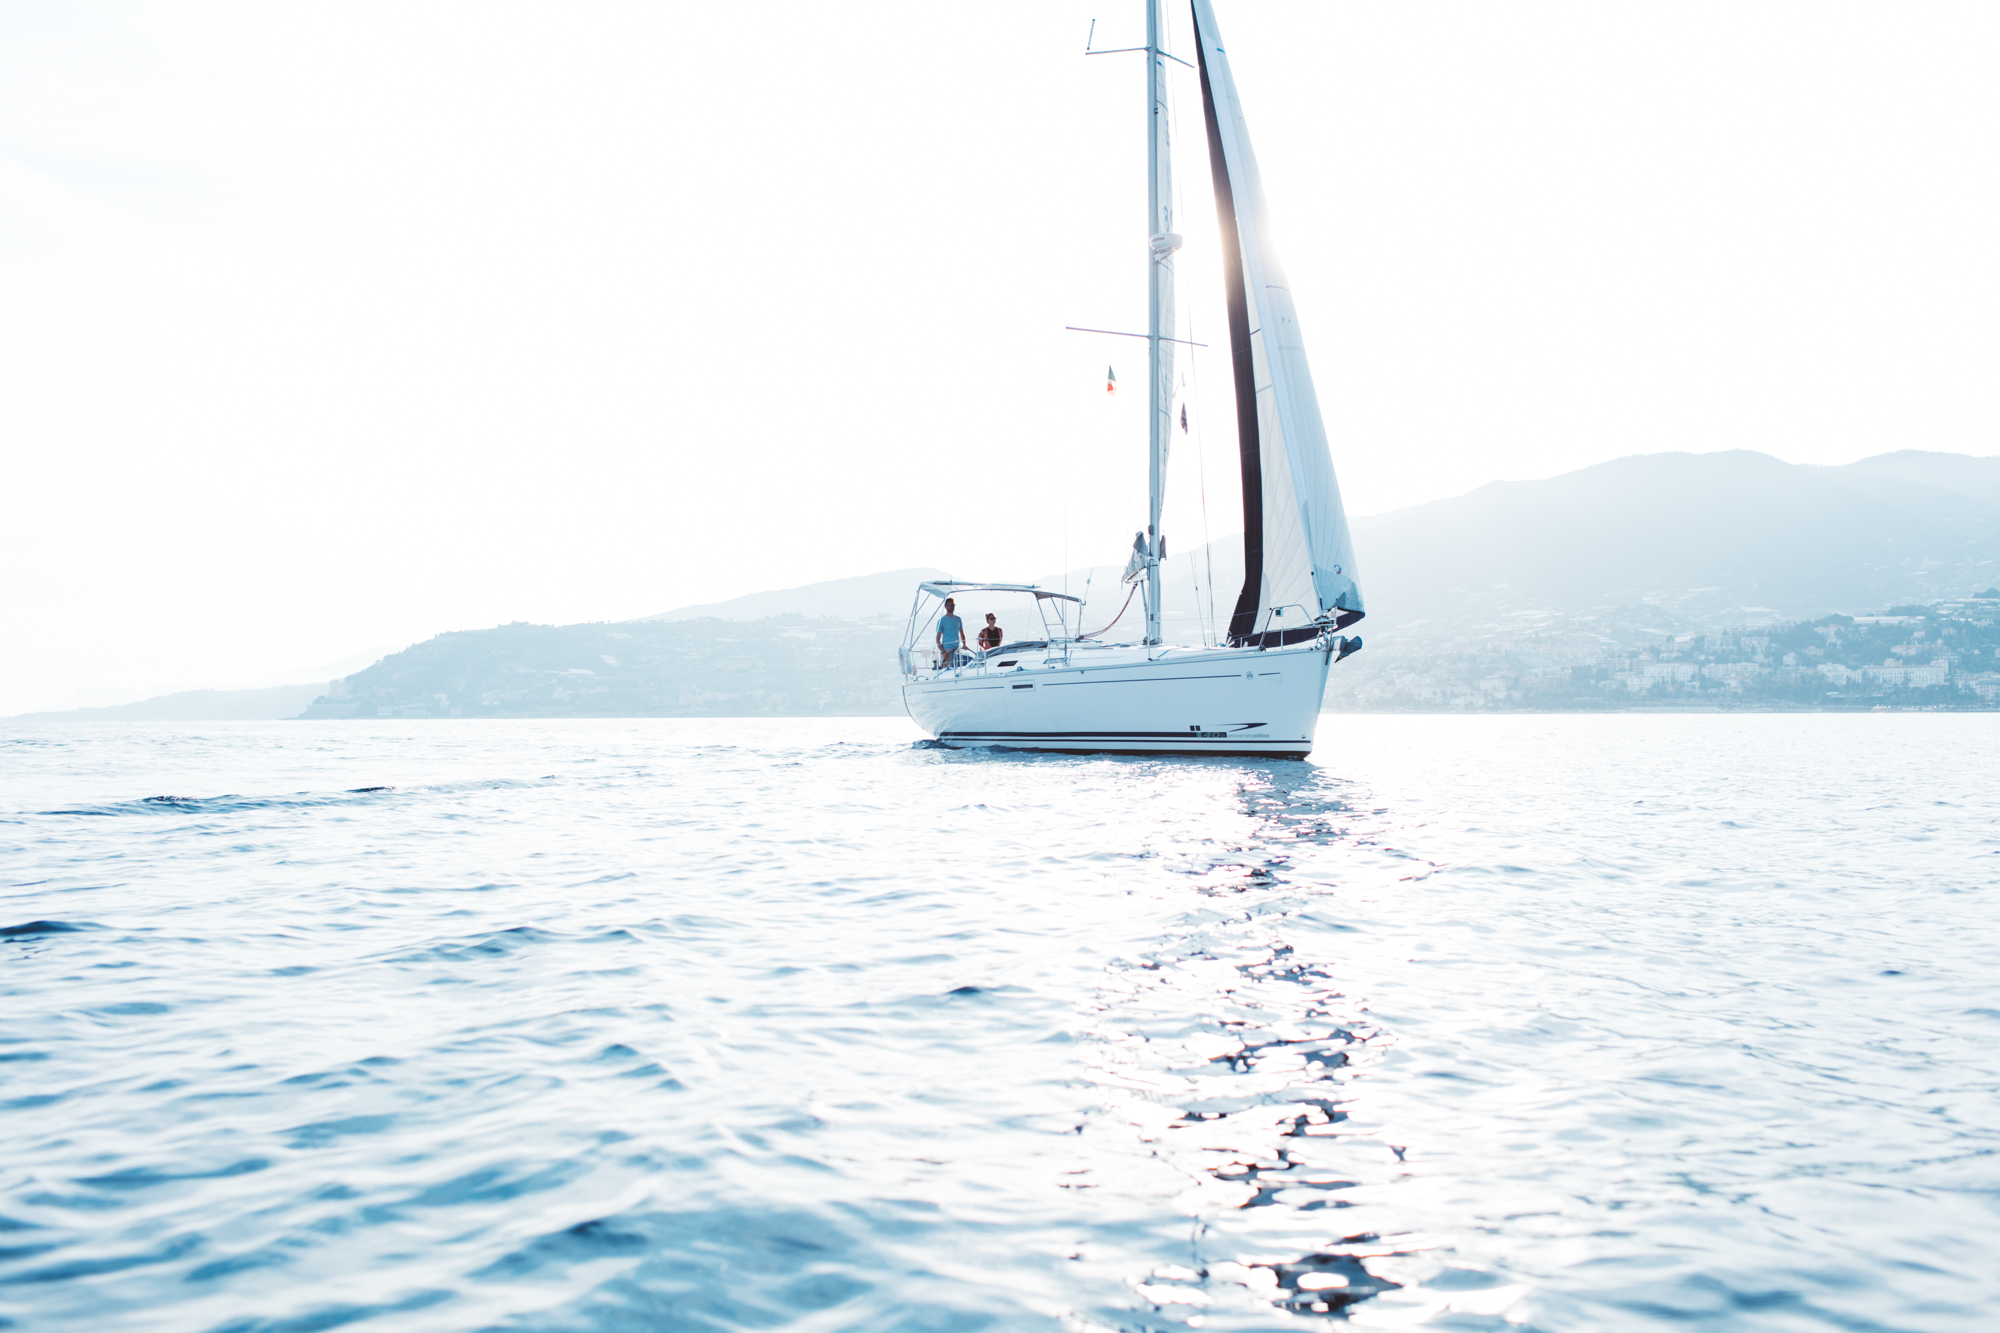 296-EpicBoatJourney-5220.jpg